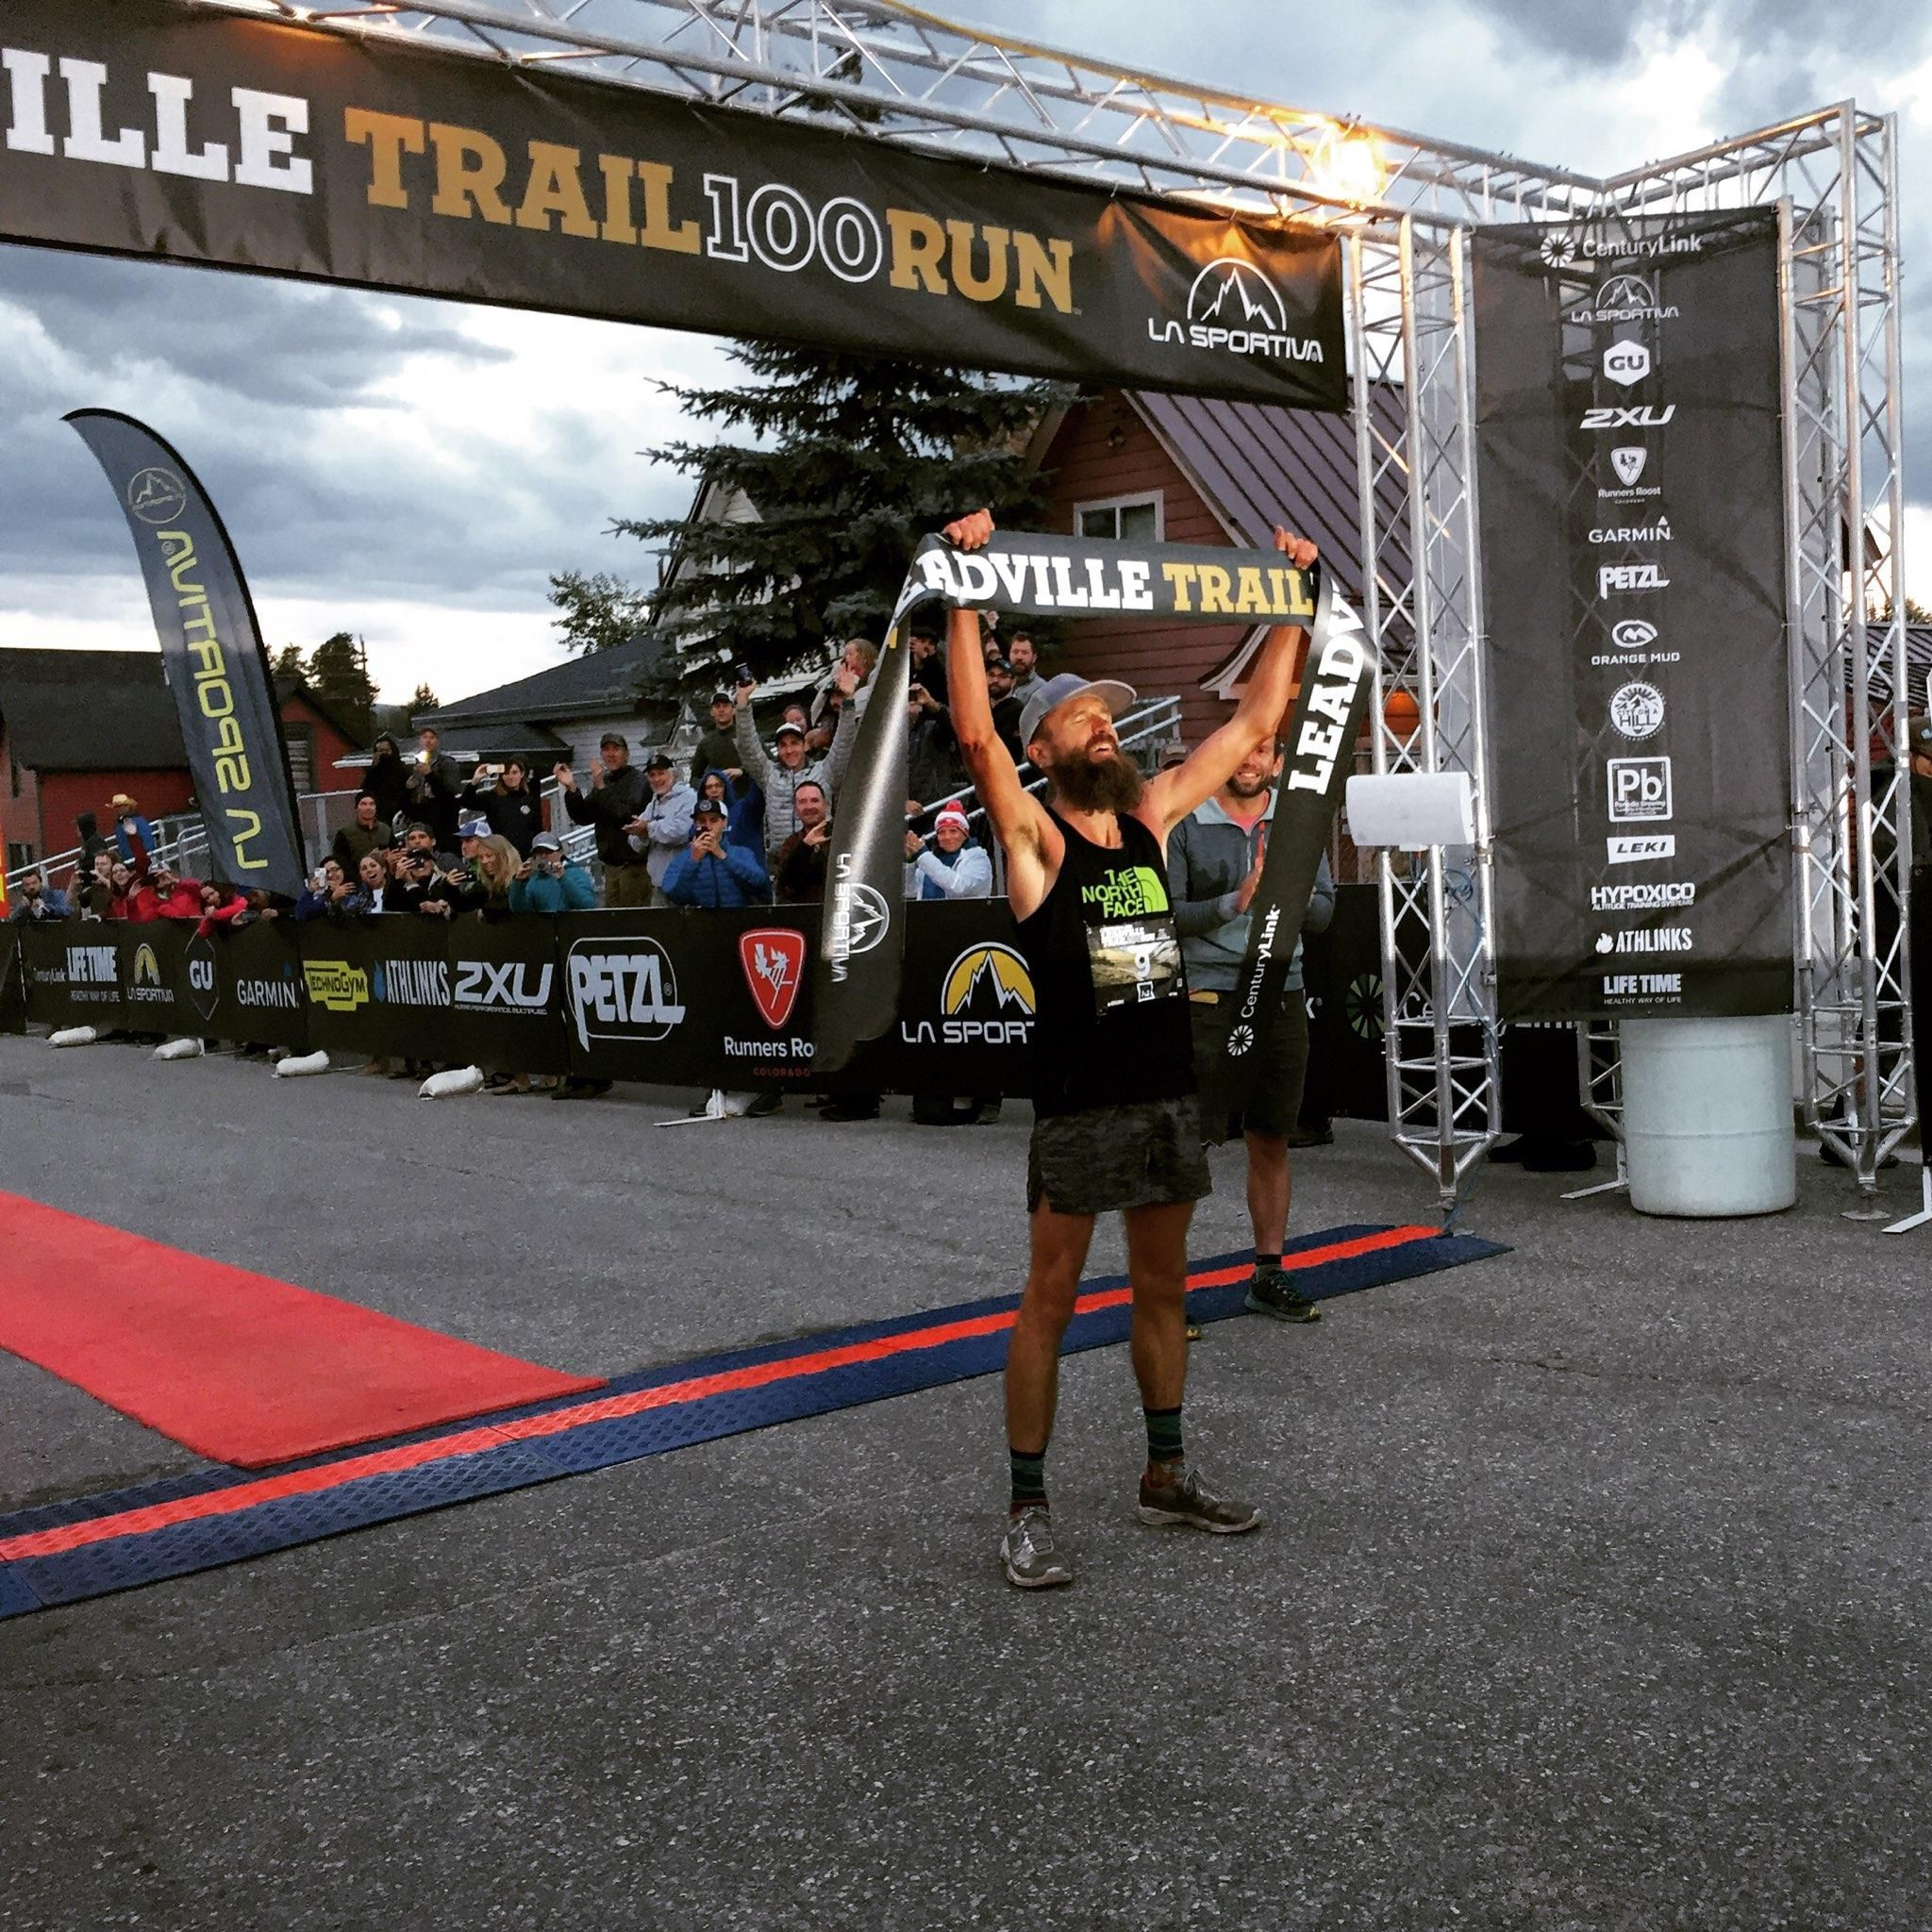 Rob Krar and Katie Arnold Win Leadville Trail 100 Run